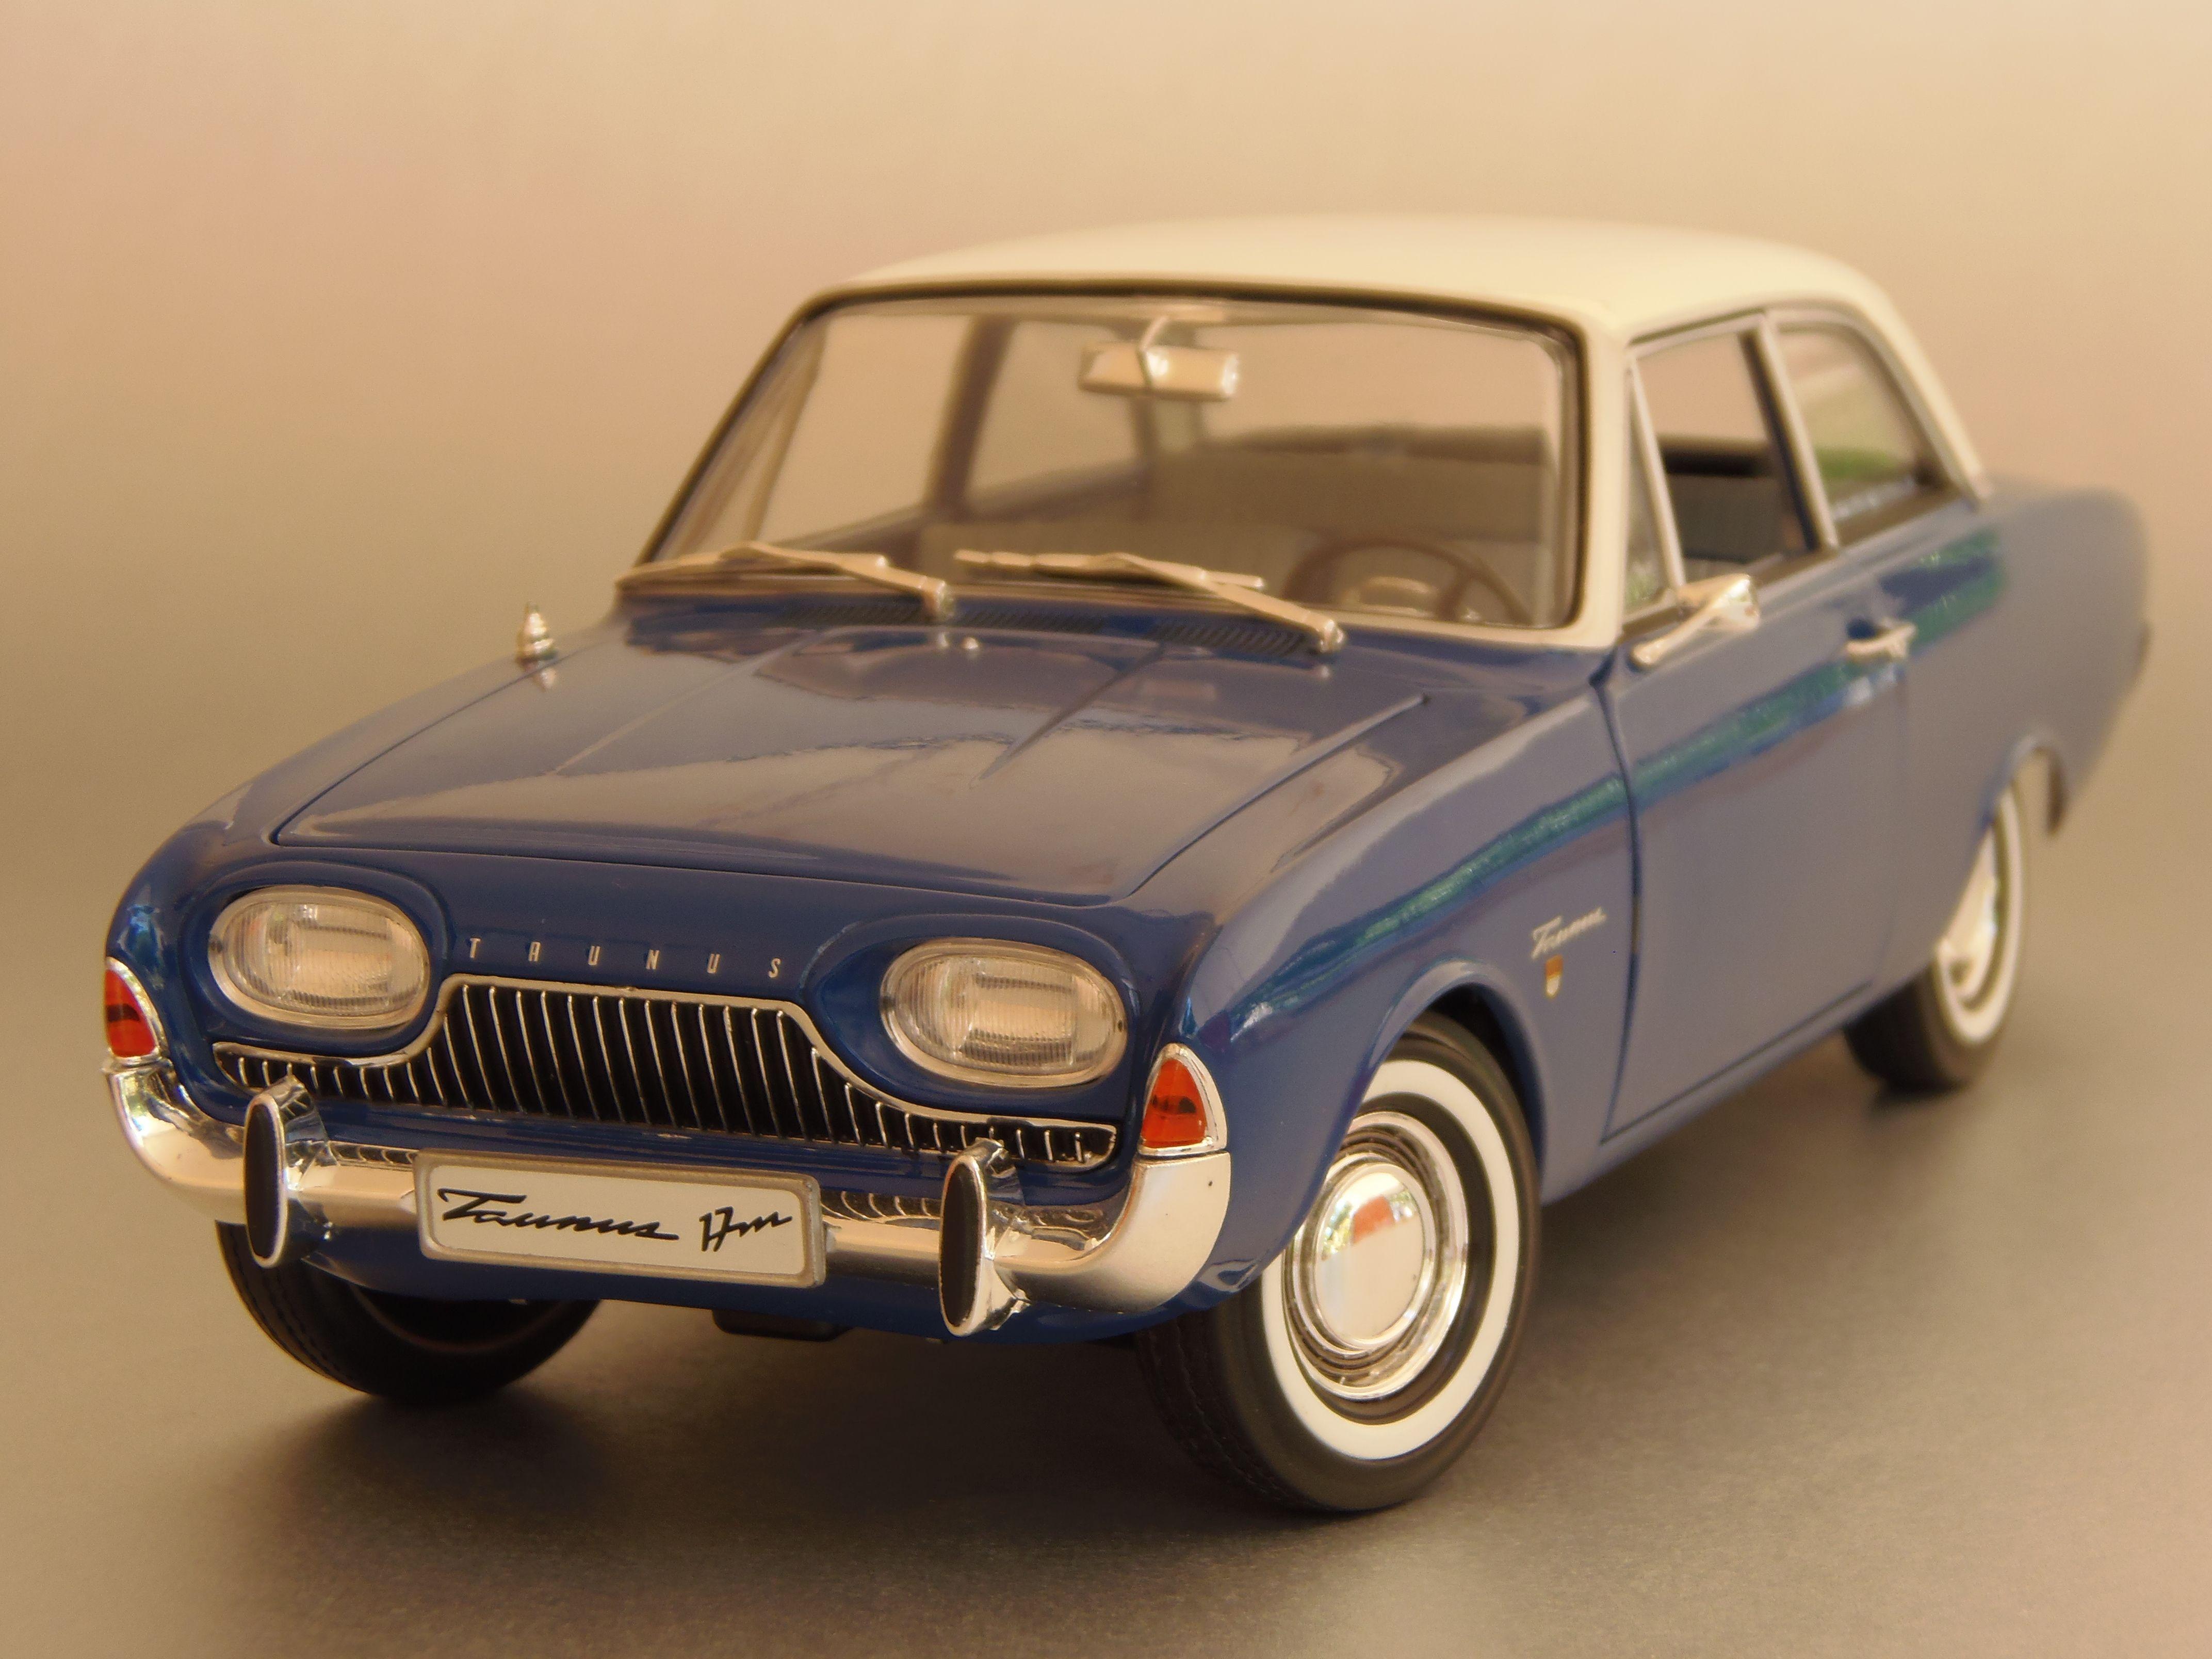 1960 ford taunus 17m p3 ford germany 1698ccm 4cyl 55hp 1960 1964